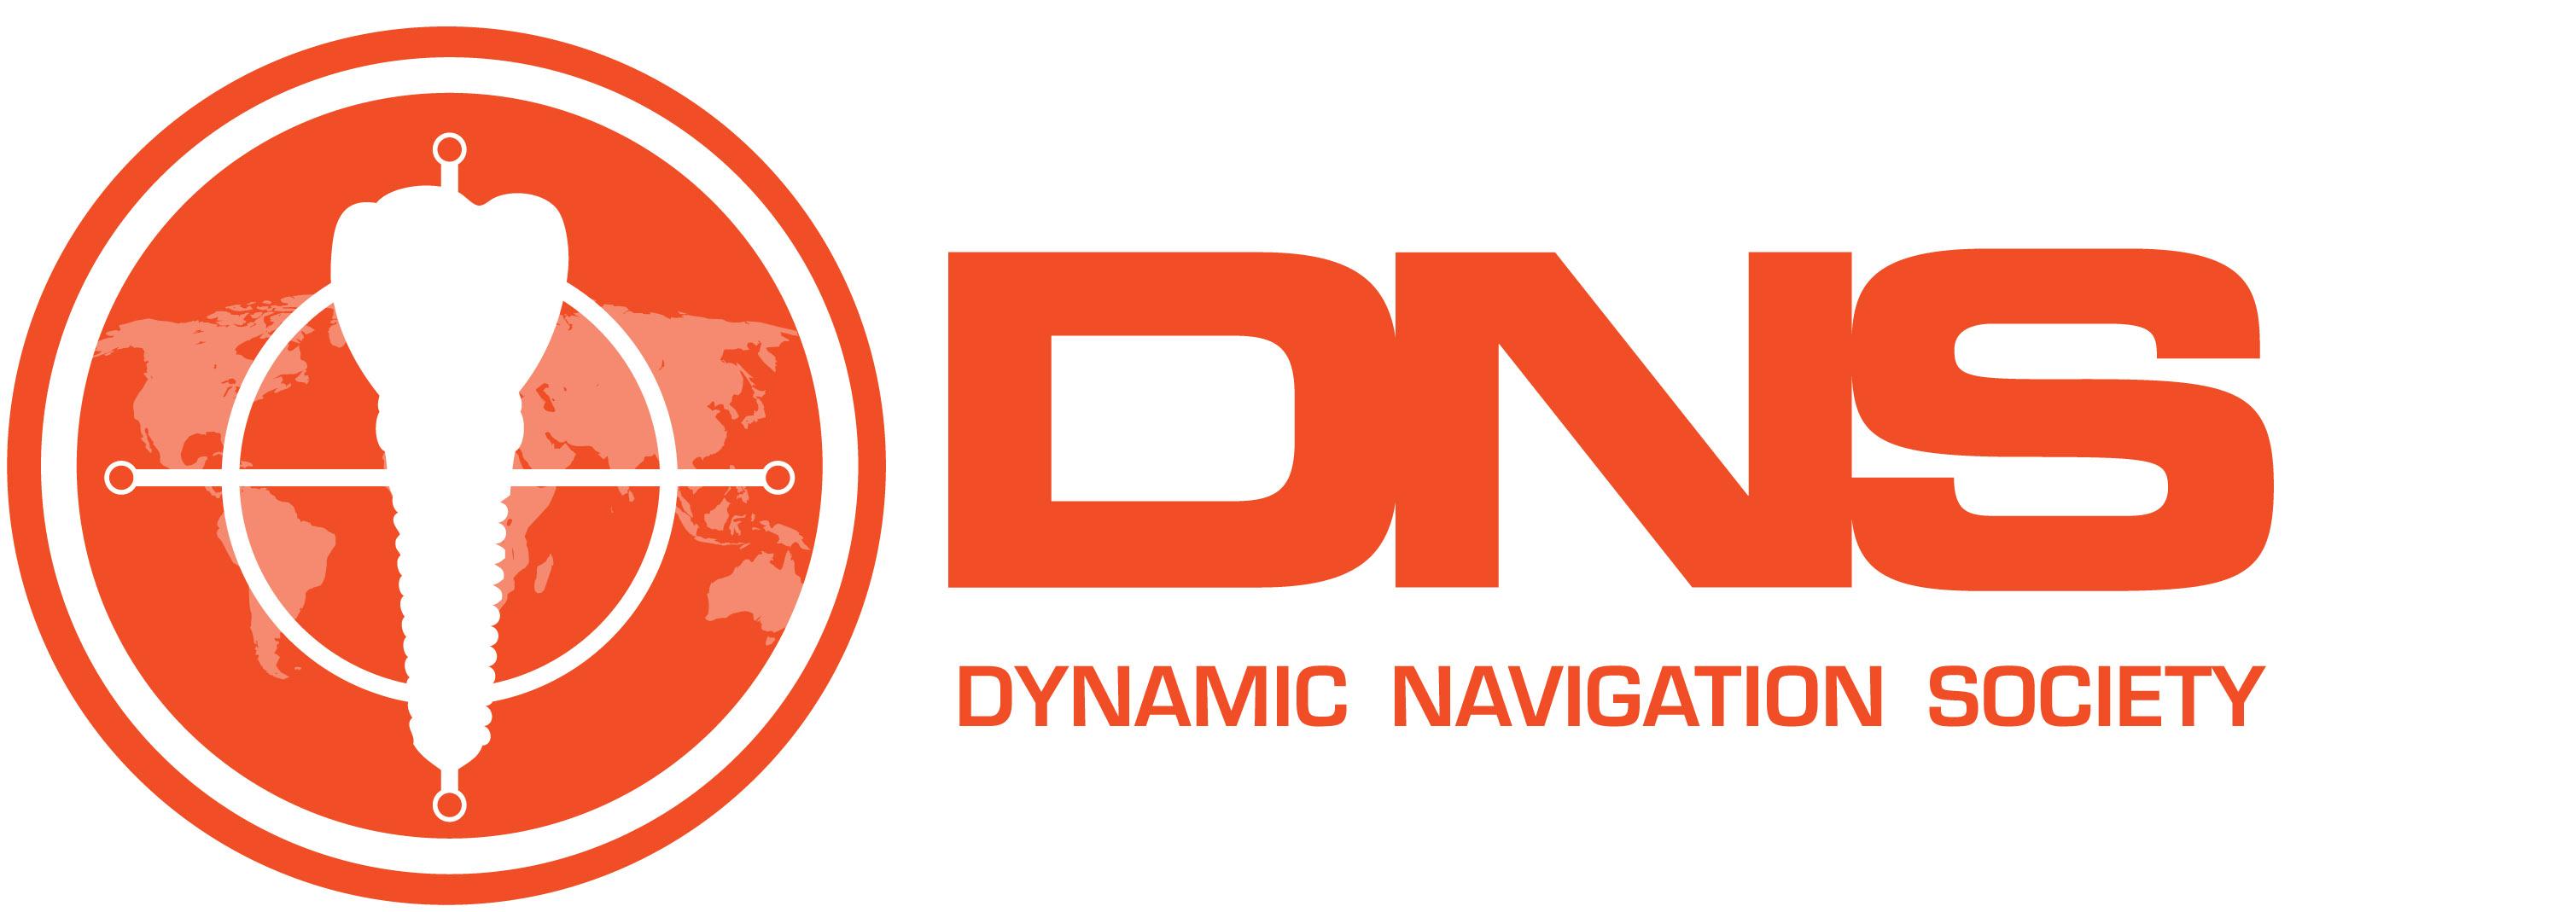 logoSamples2a - DNS.jpg